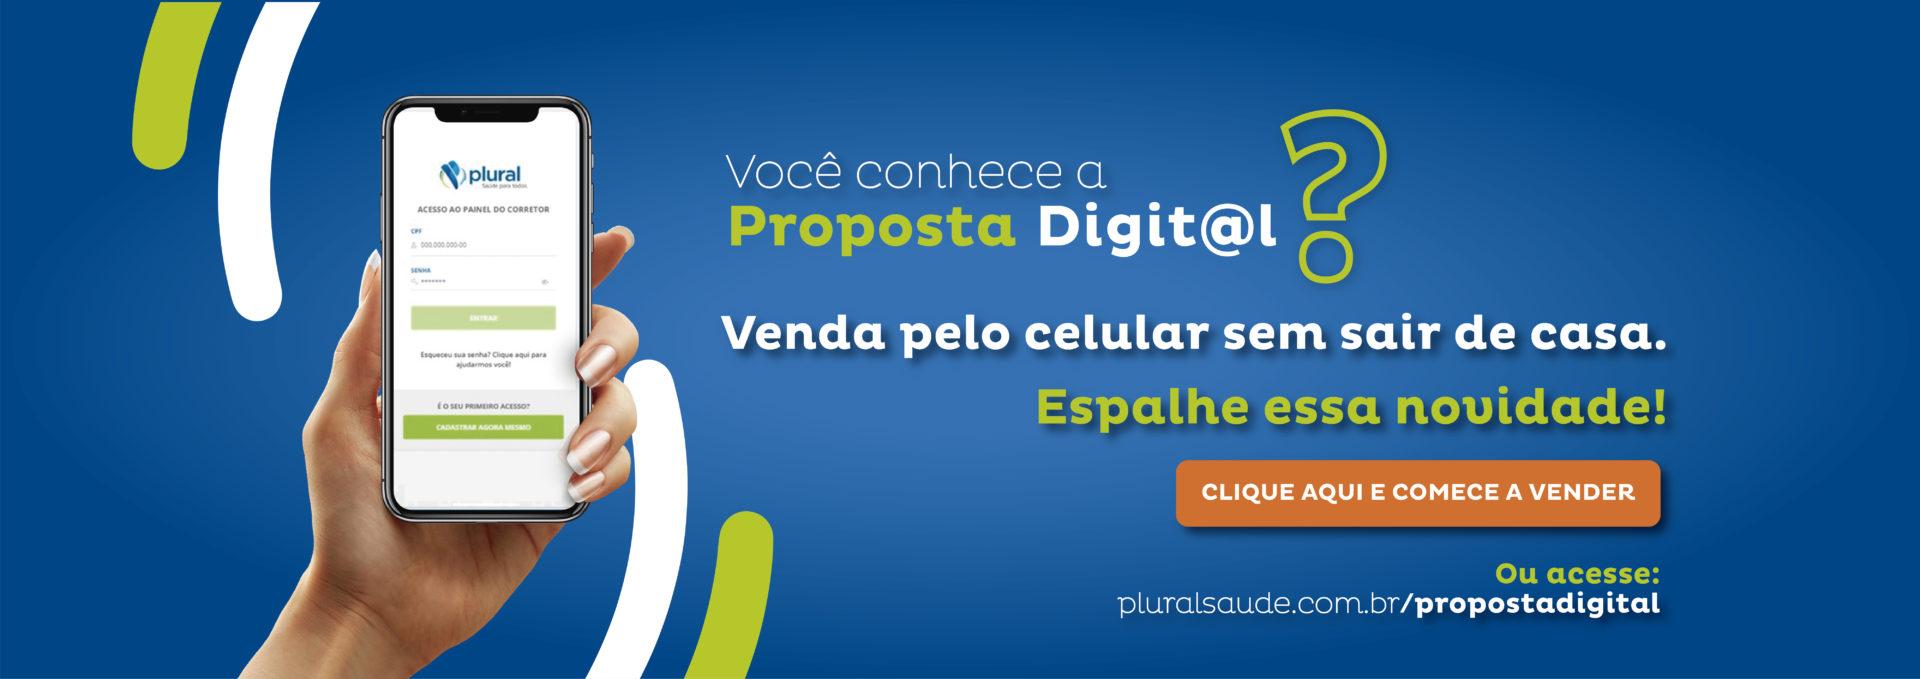 Proposta Digital - Plural Saúde